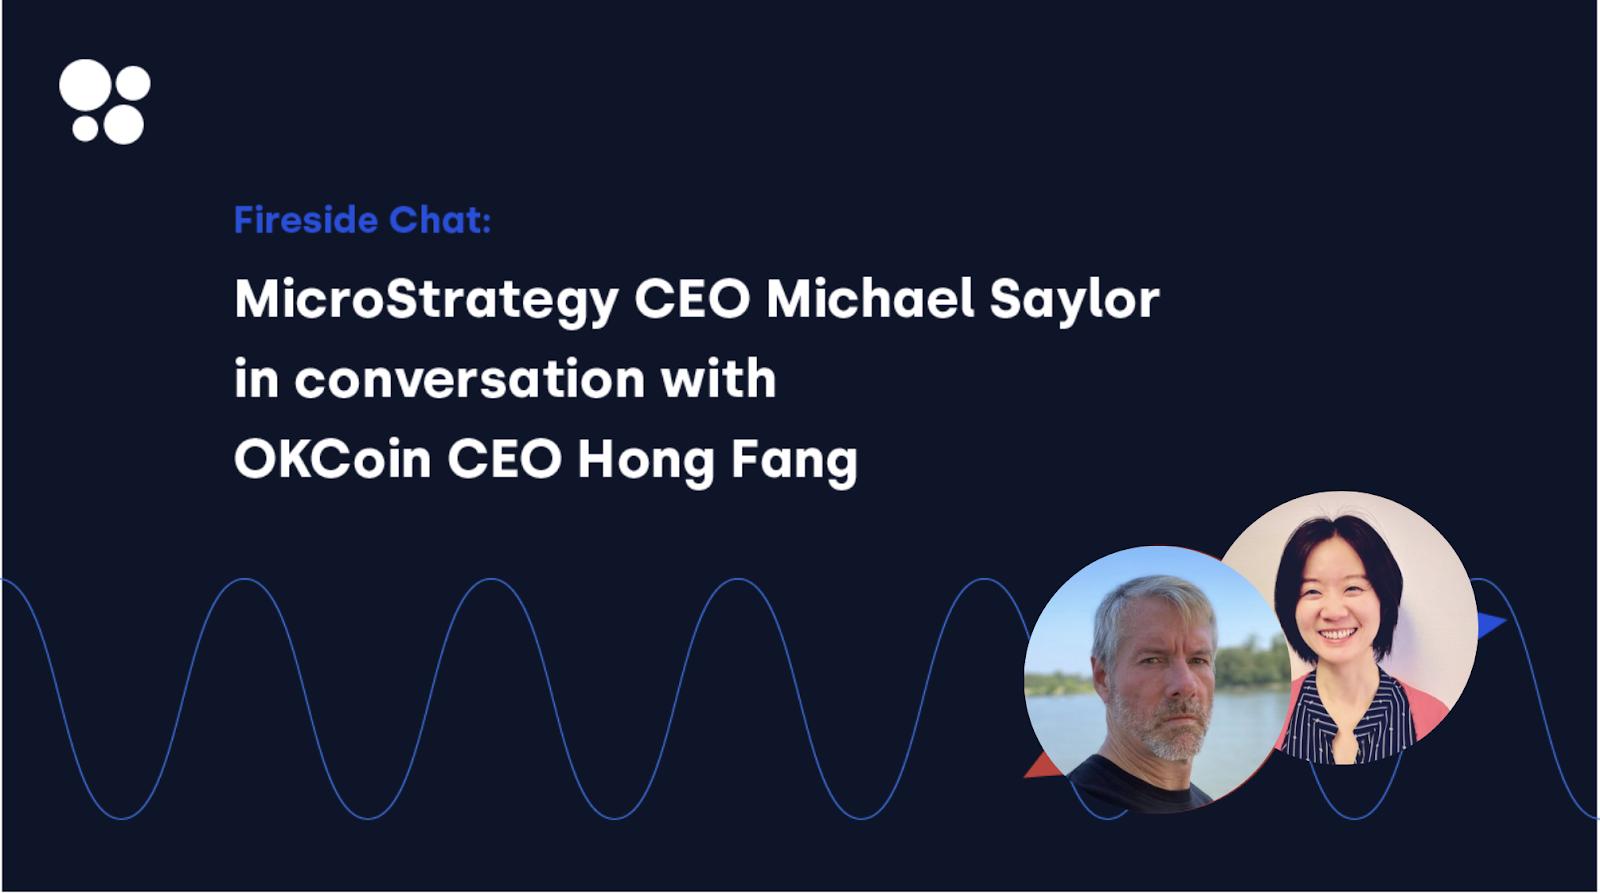 Michael Saylor and Hong Fang fireside chat image